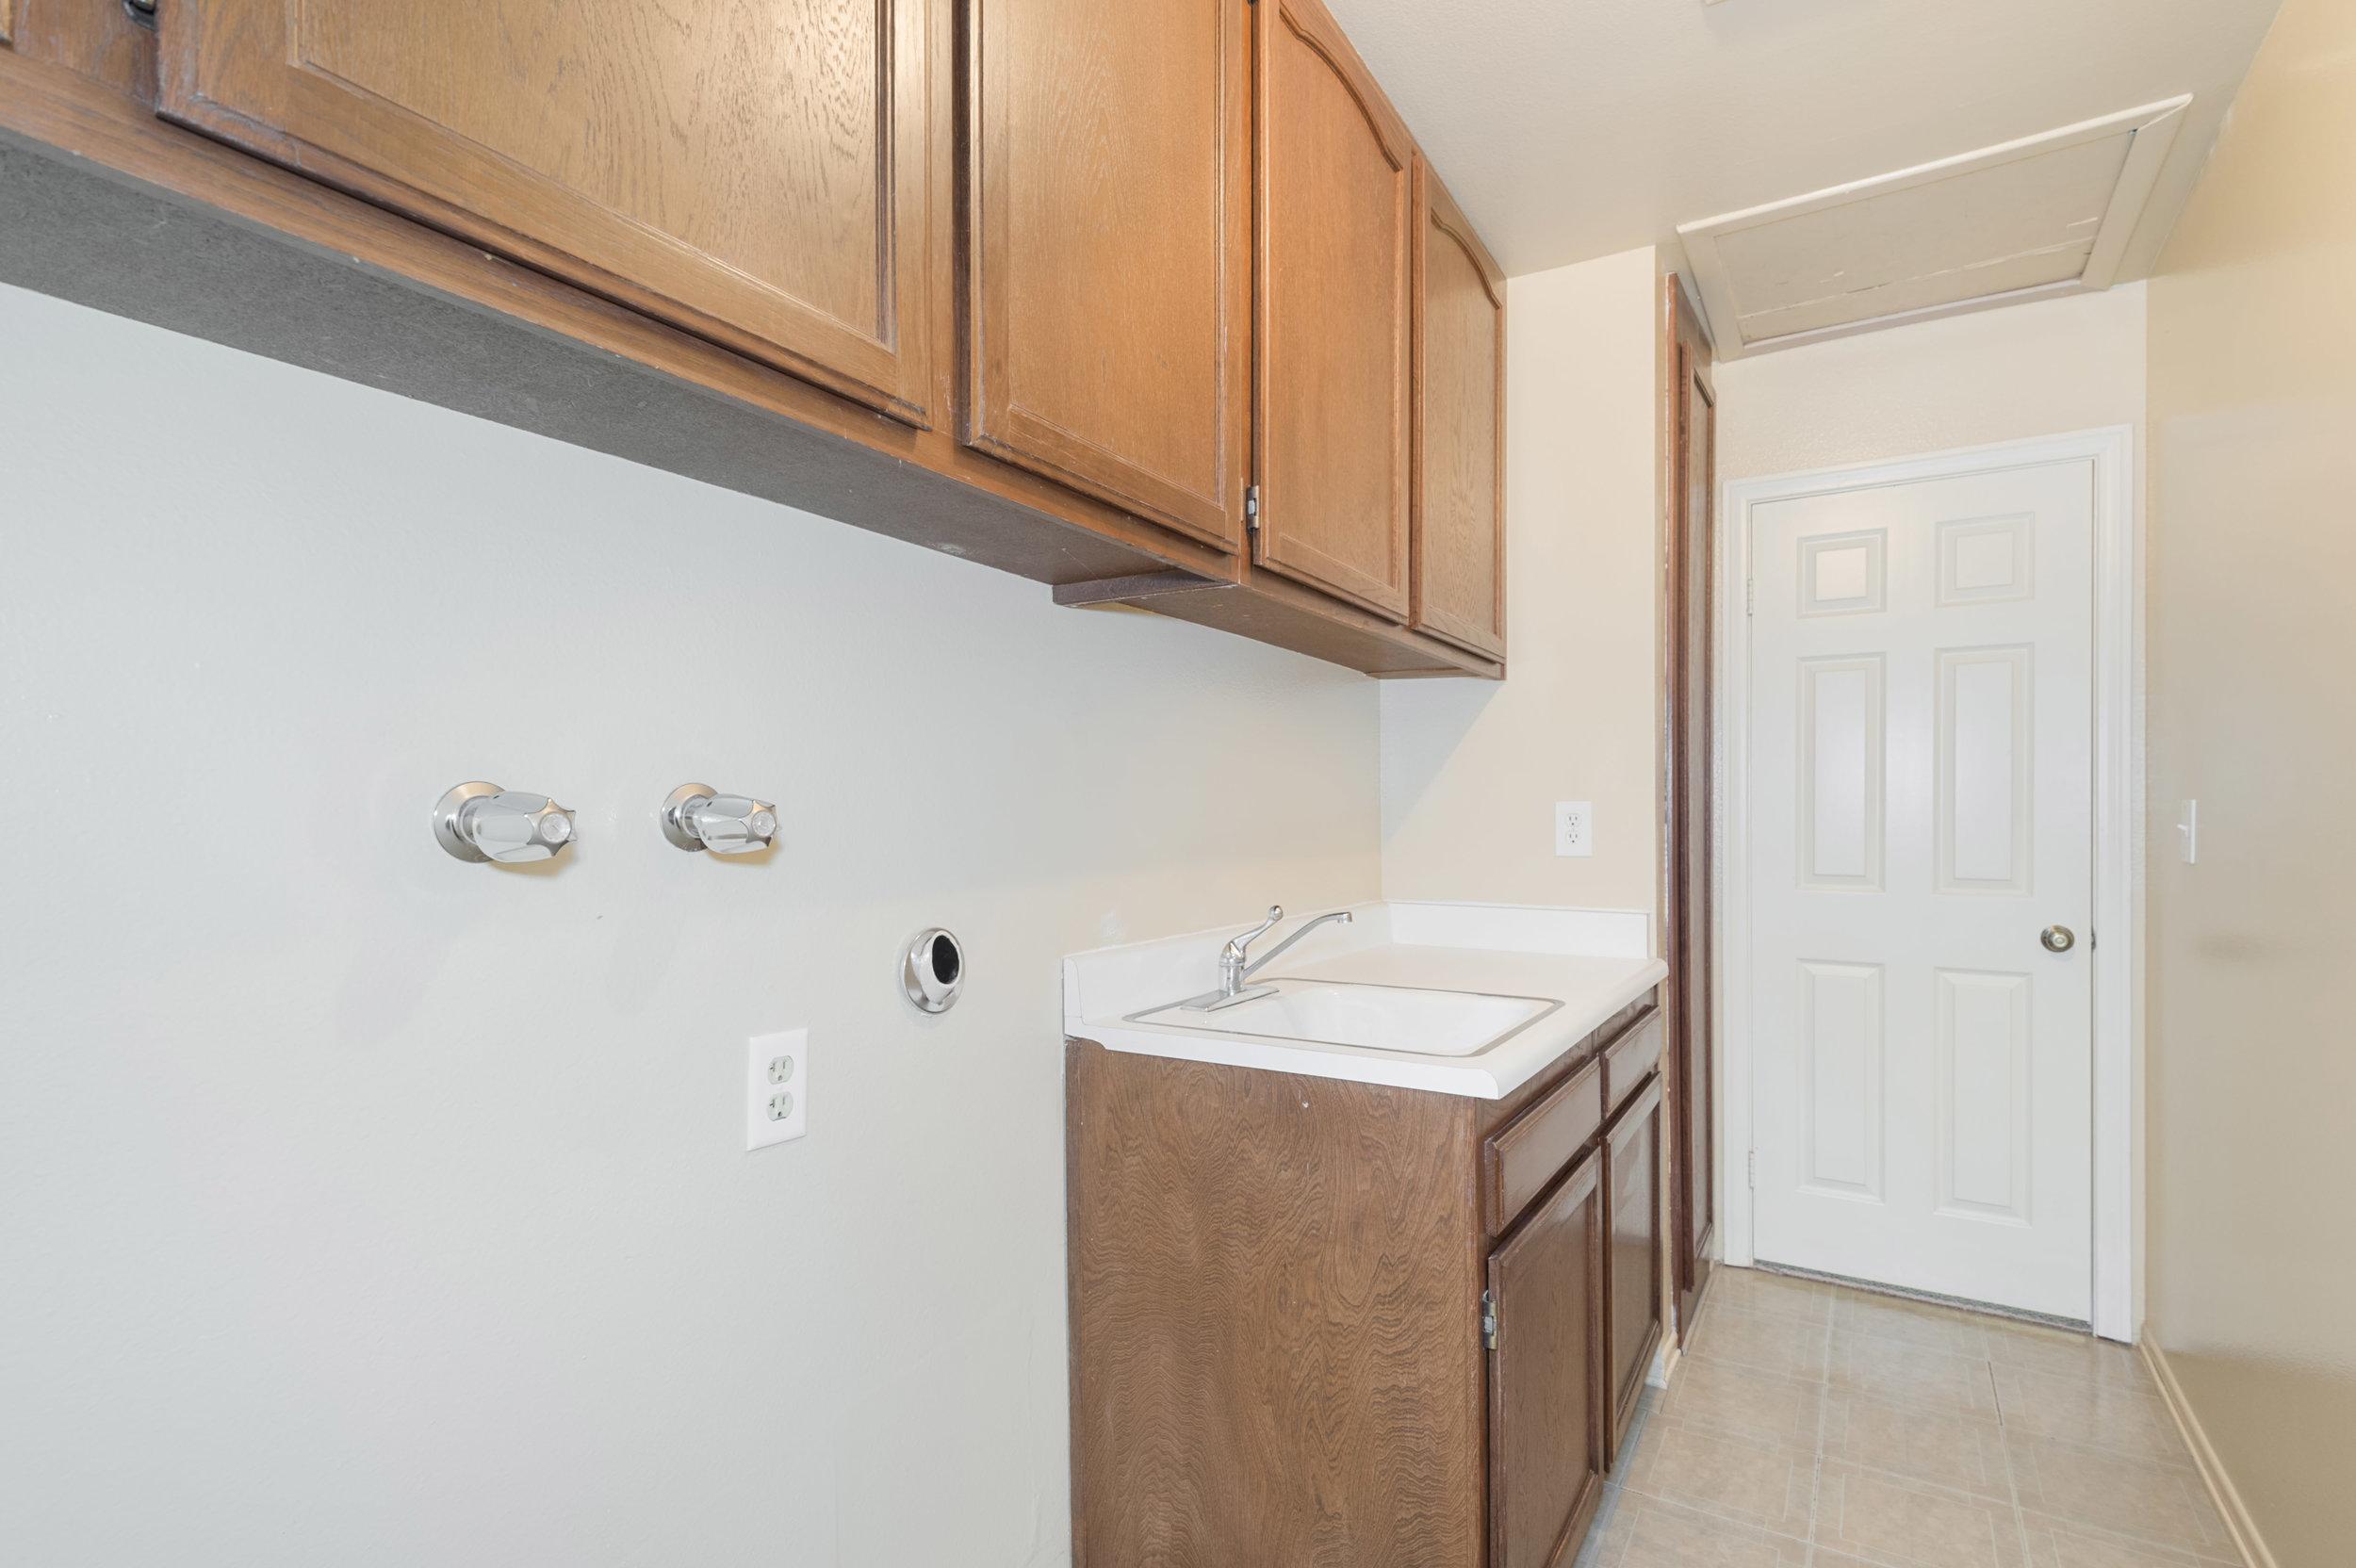 019 laundry 8832 Moorcroft Avenue West Hills For Sale Lease The Malibu Life Team Luxury Real Estate.jpg